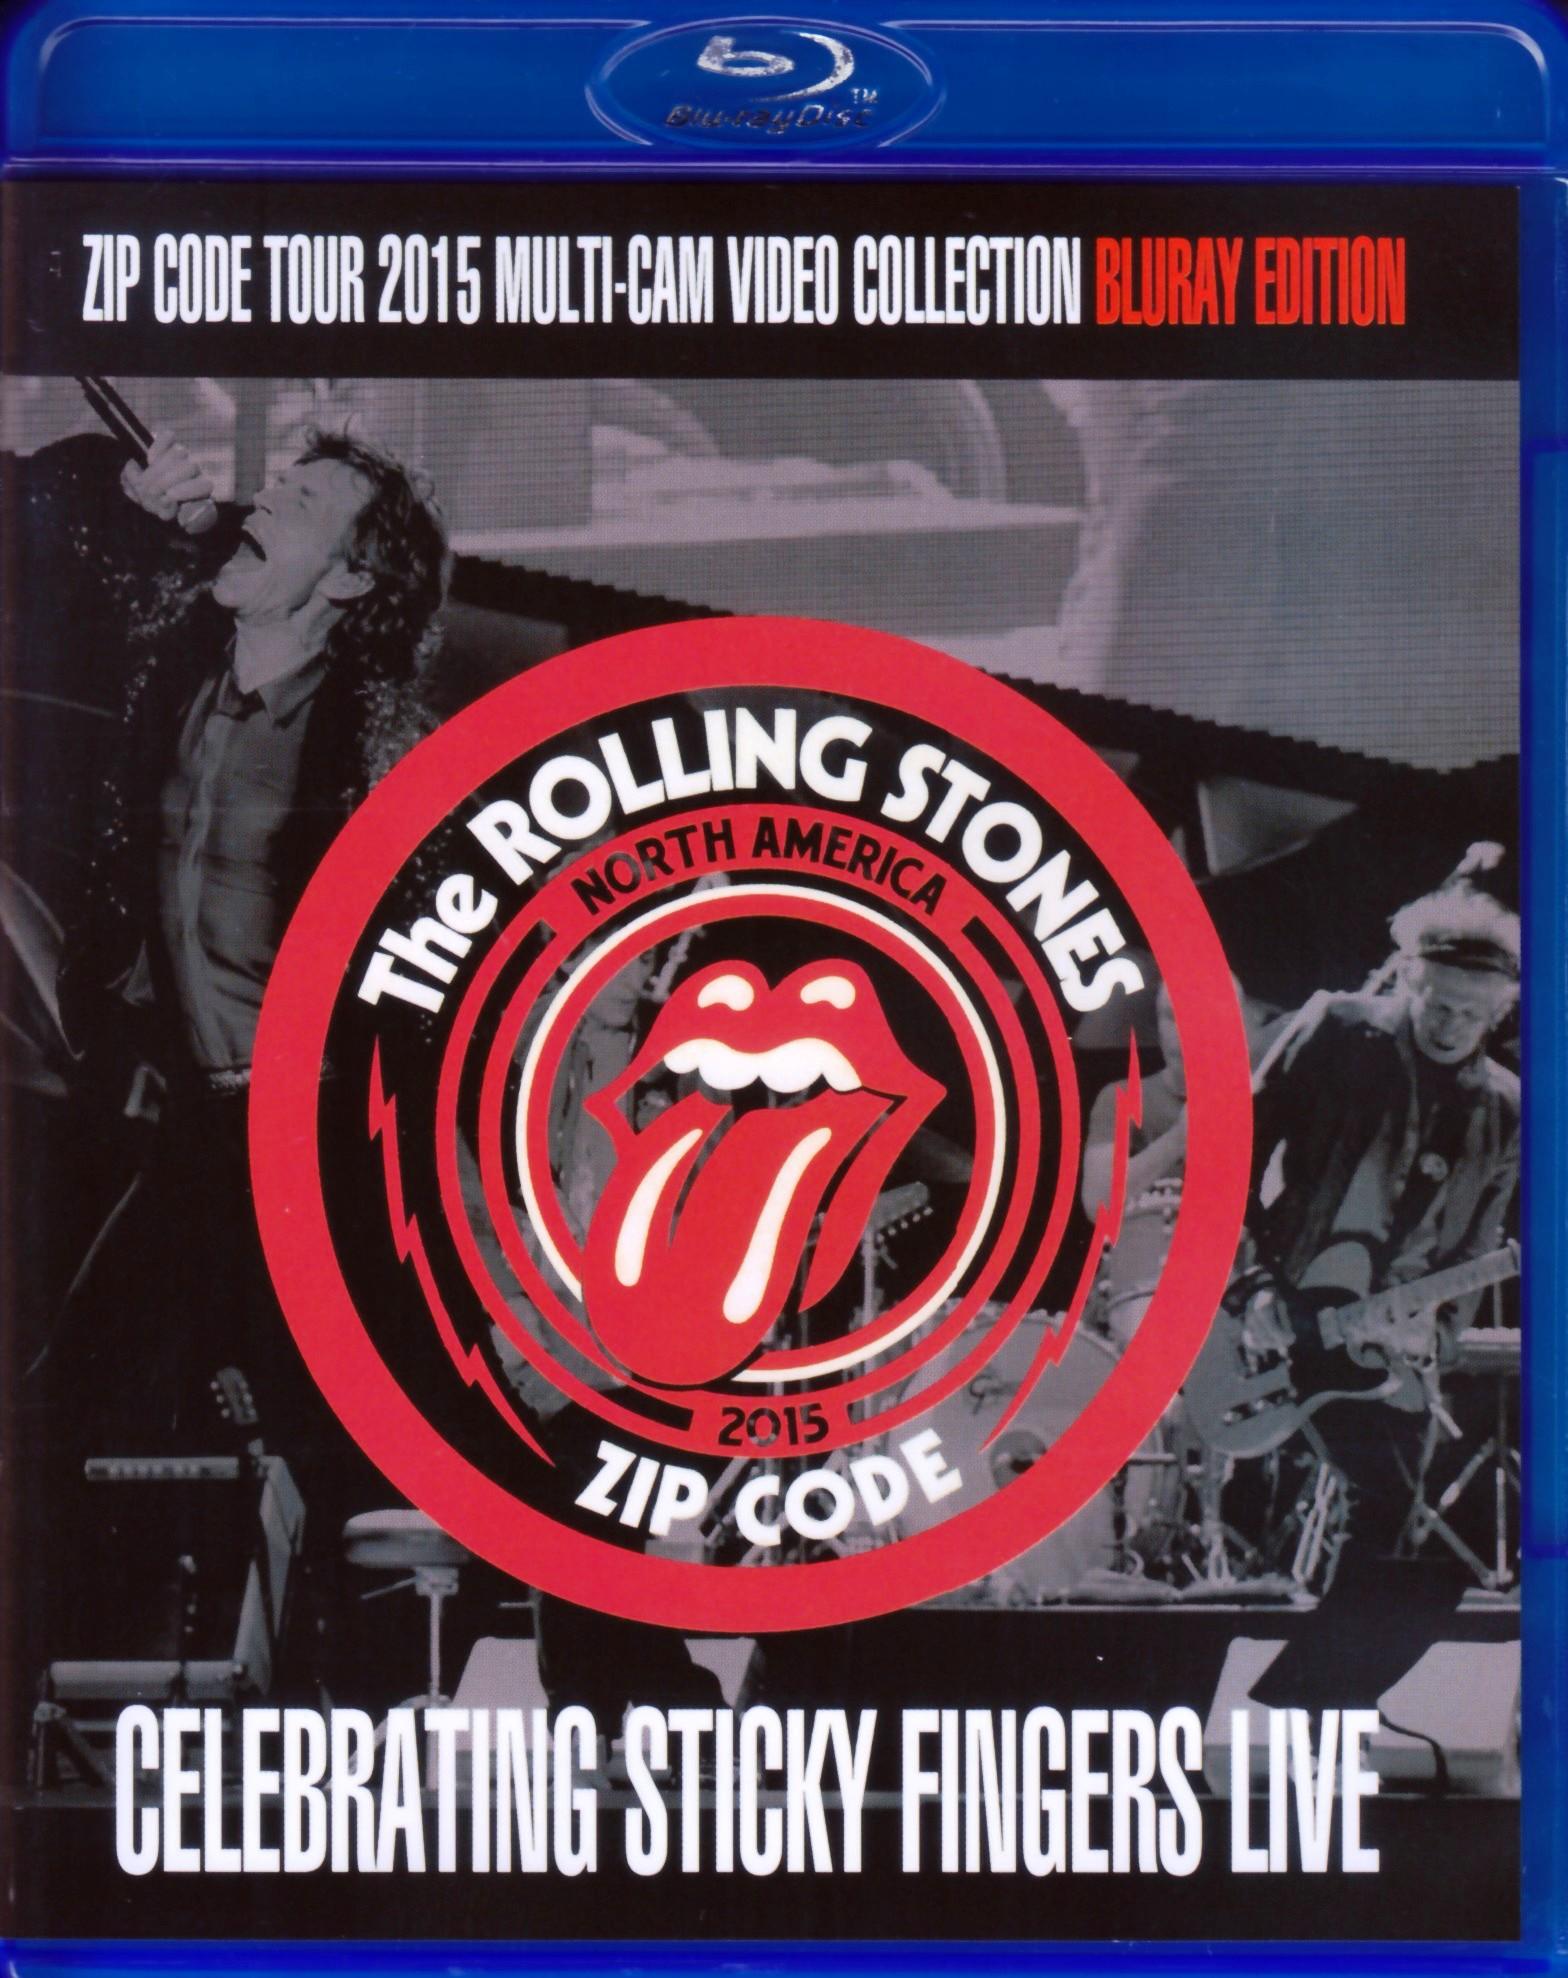 Rolling Stones ローリング・ストーンズ/North America  2015 Vol.1 Blu-Ray Version